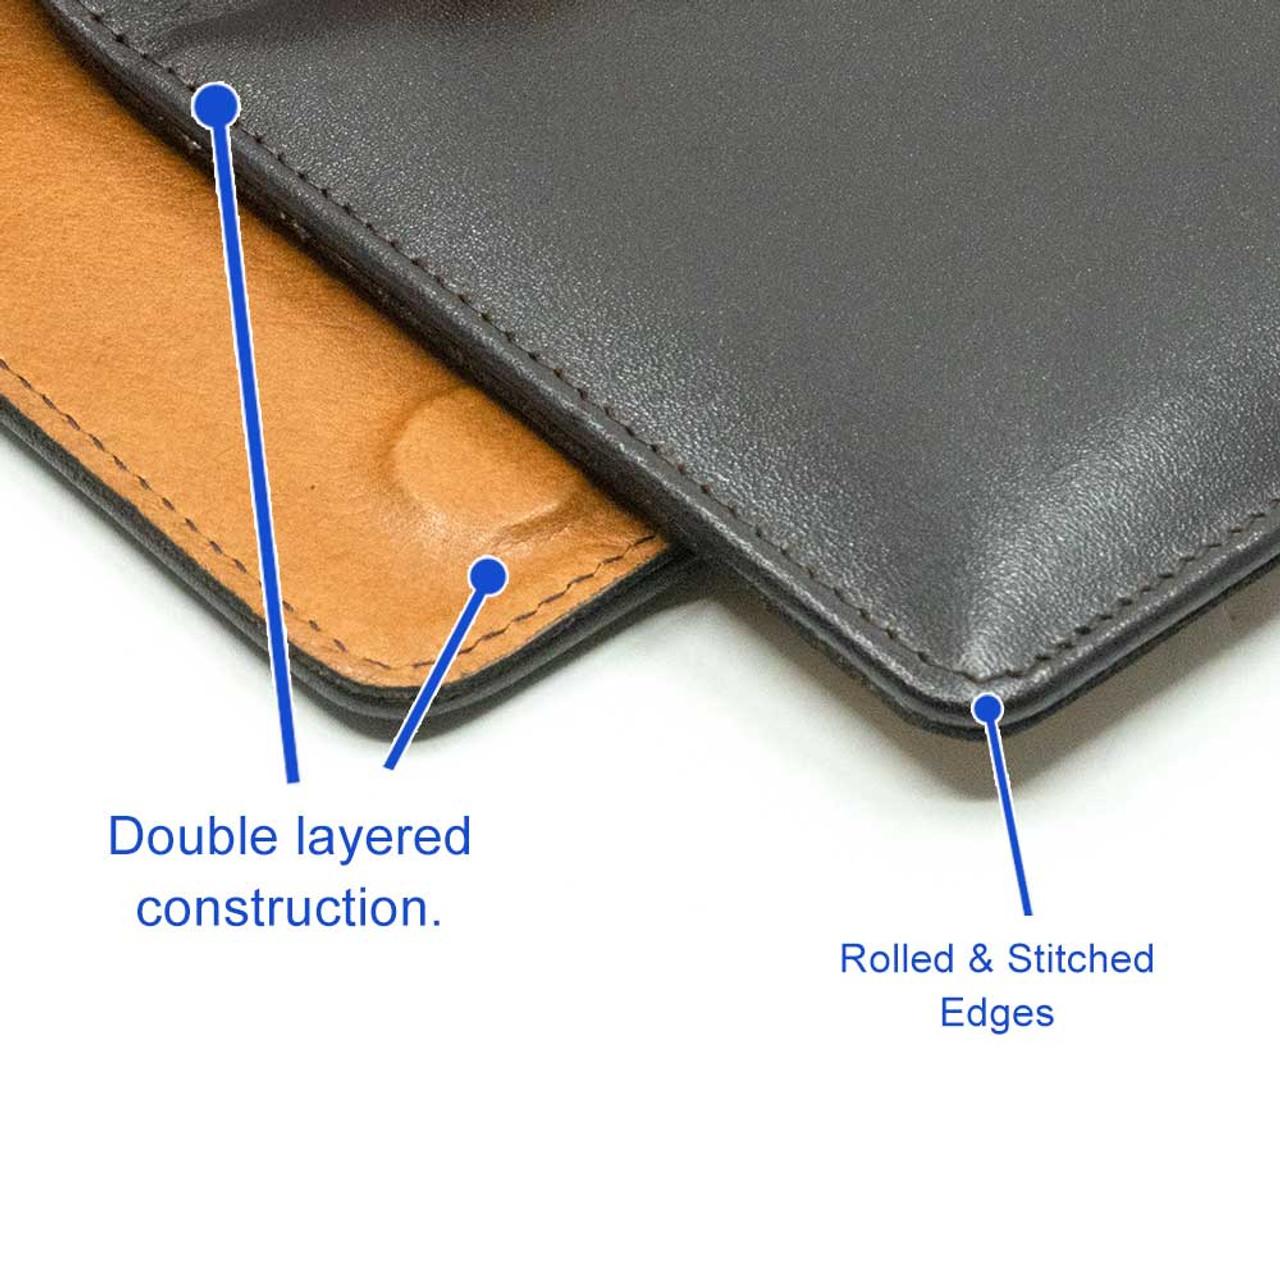 Kimber Evo Brown Leather Series Holster